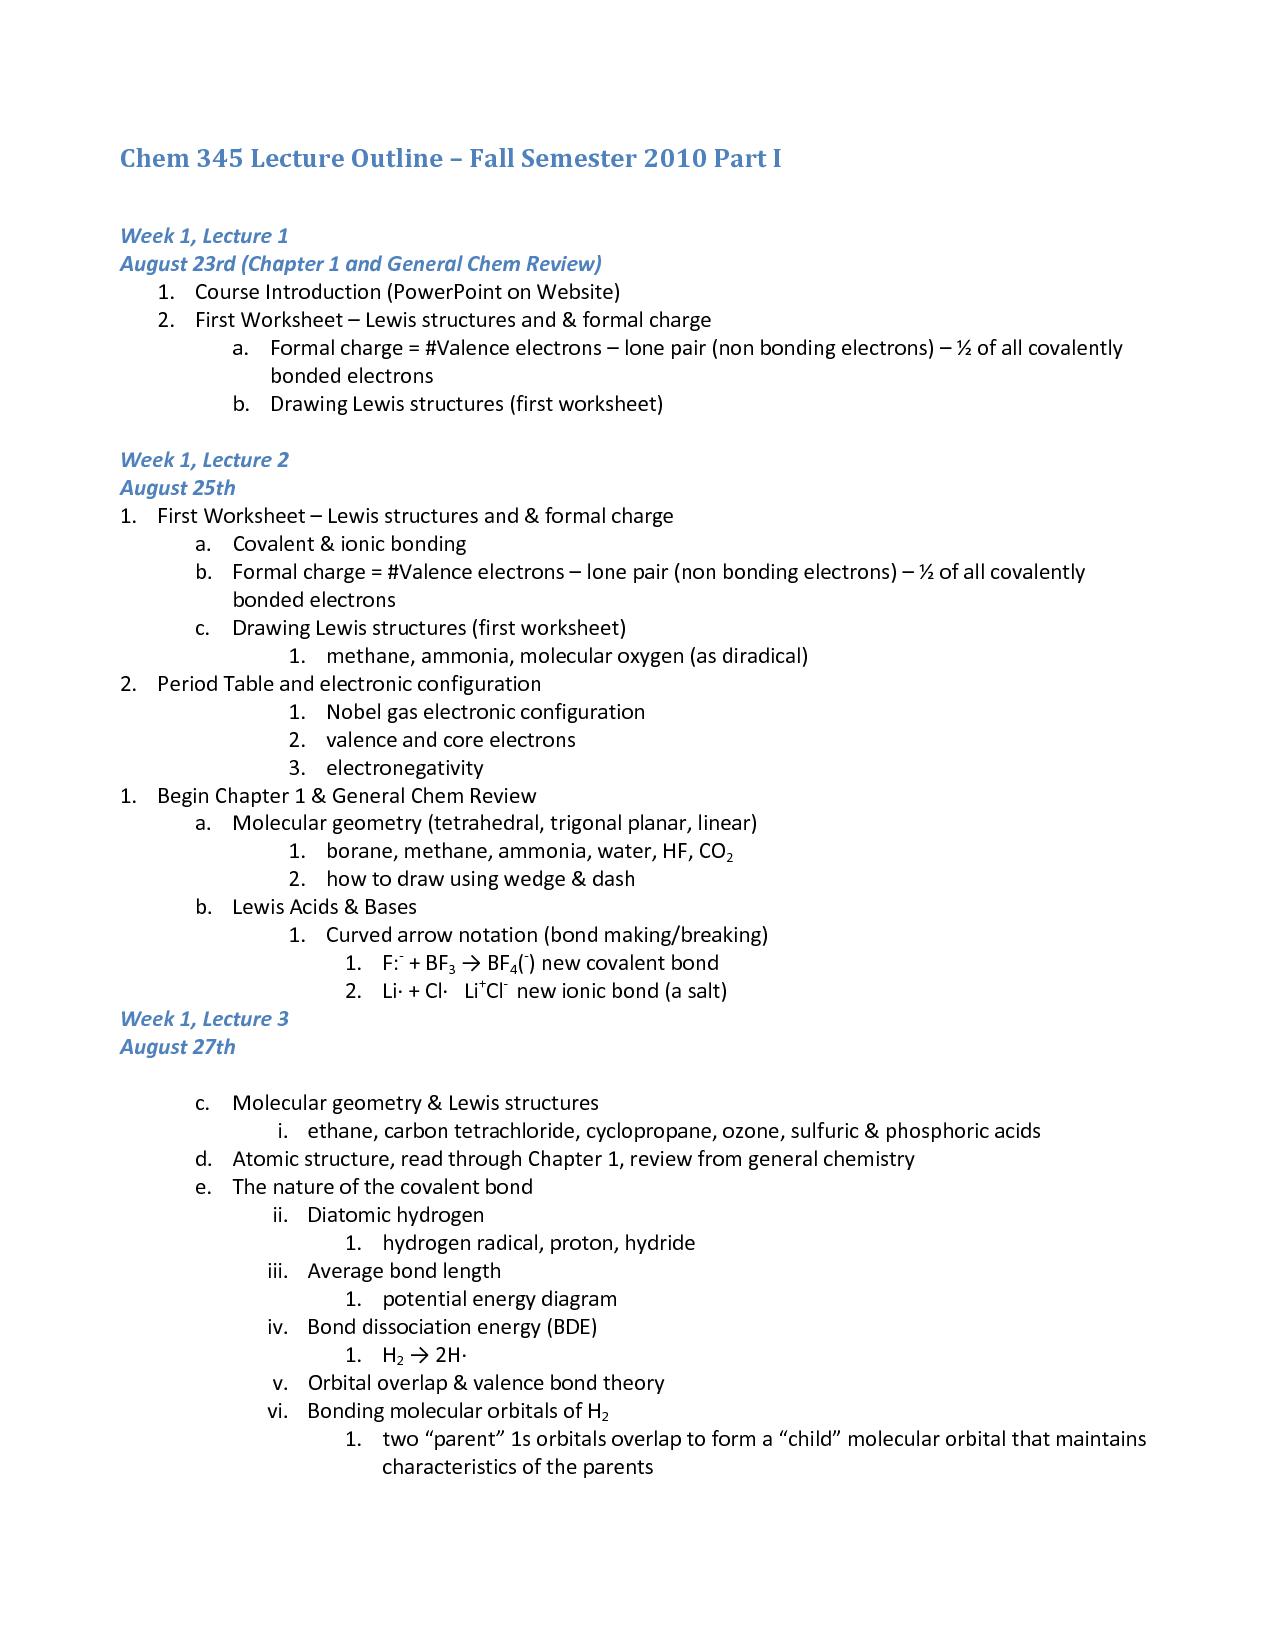 Worksheet Functional Groups Organic Chemistry